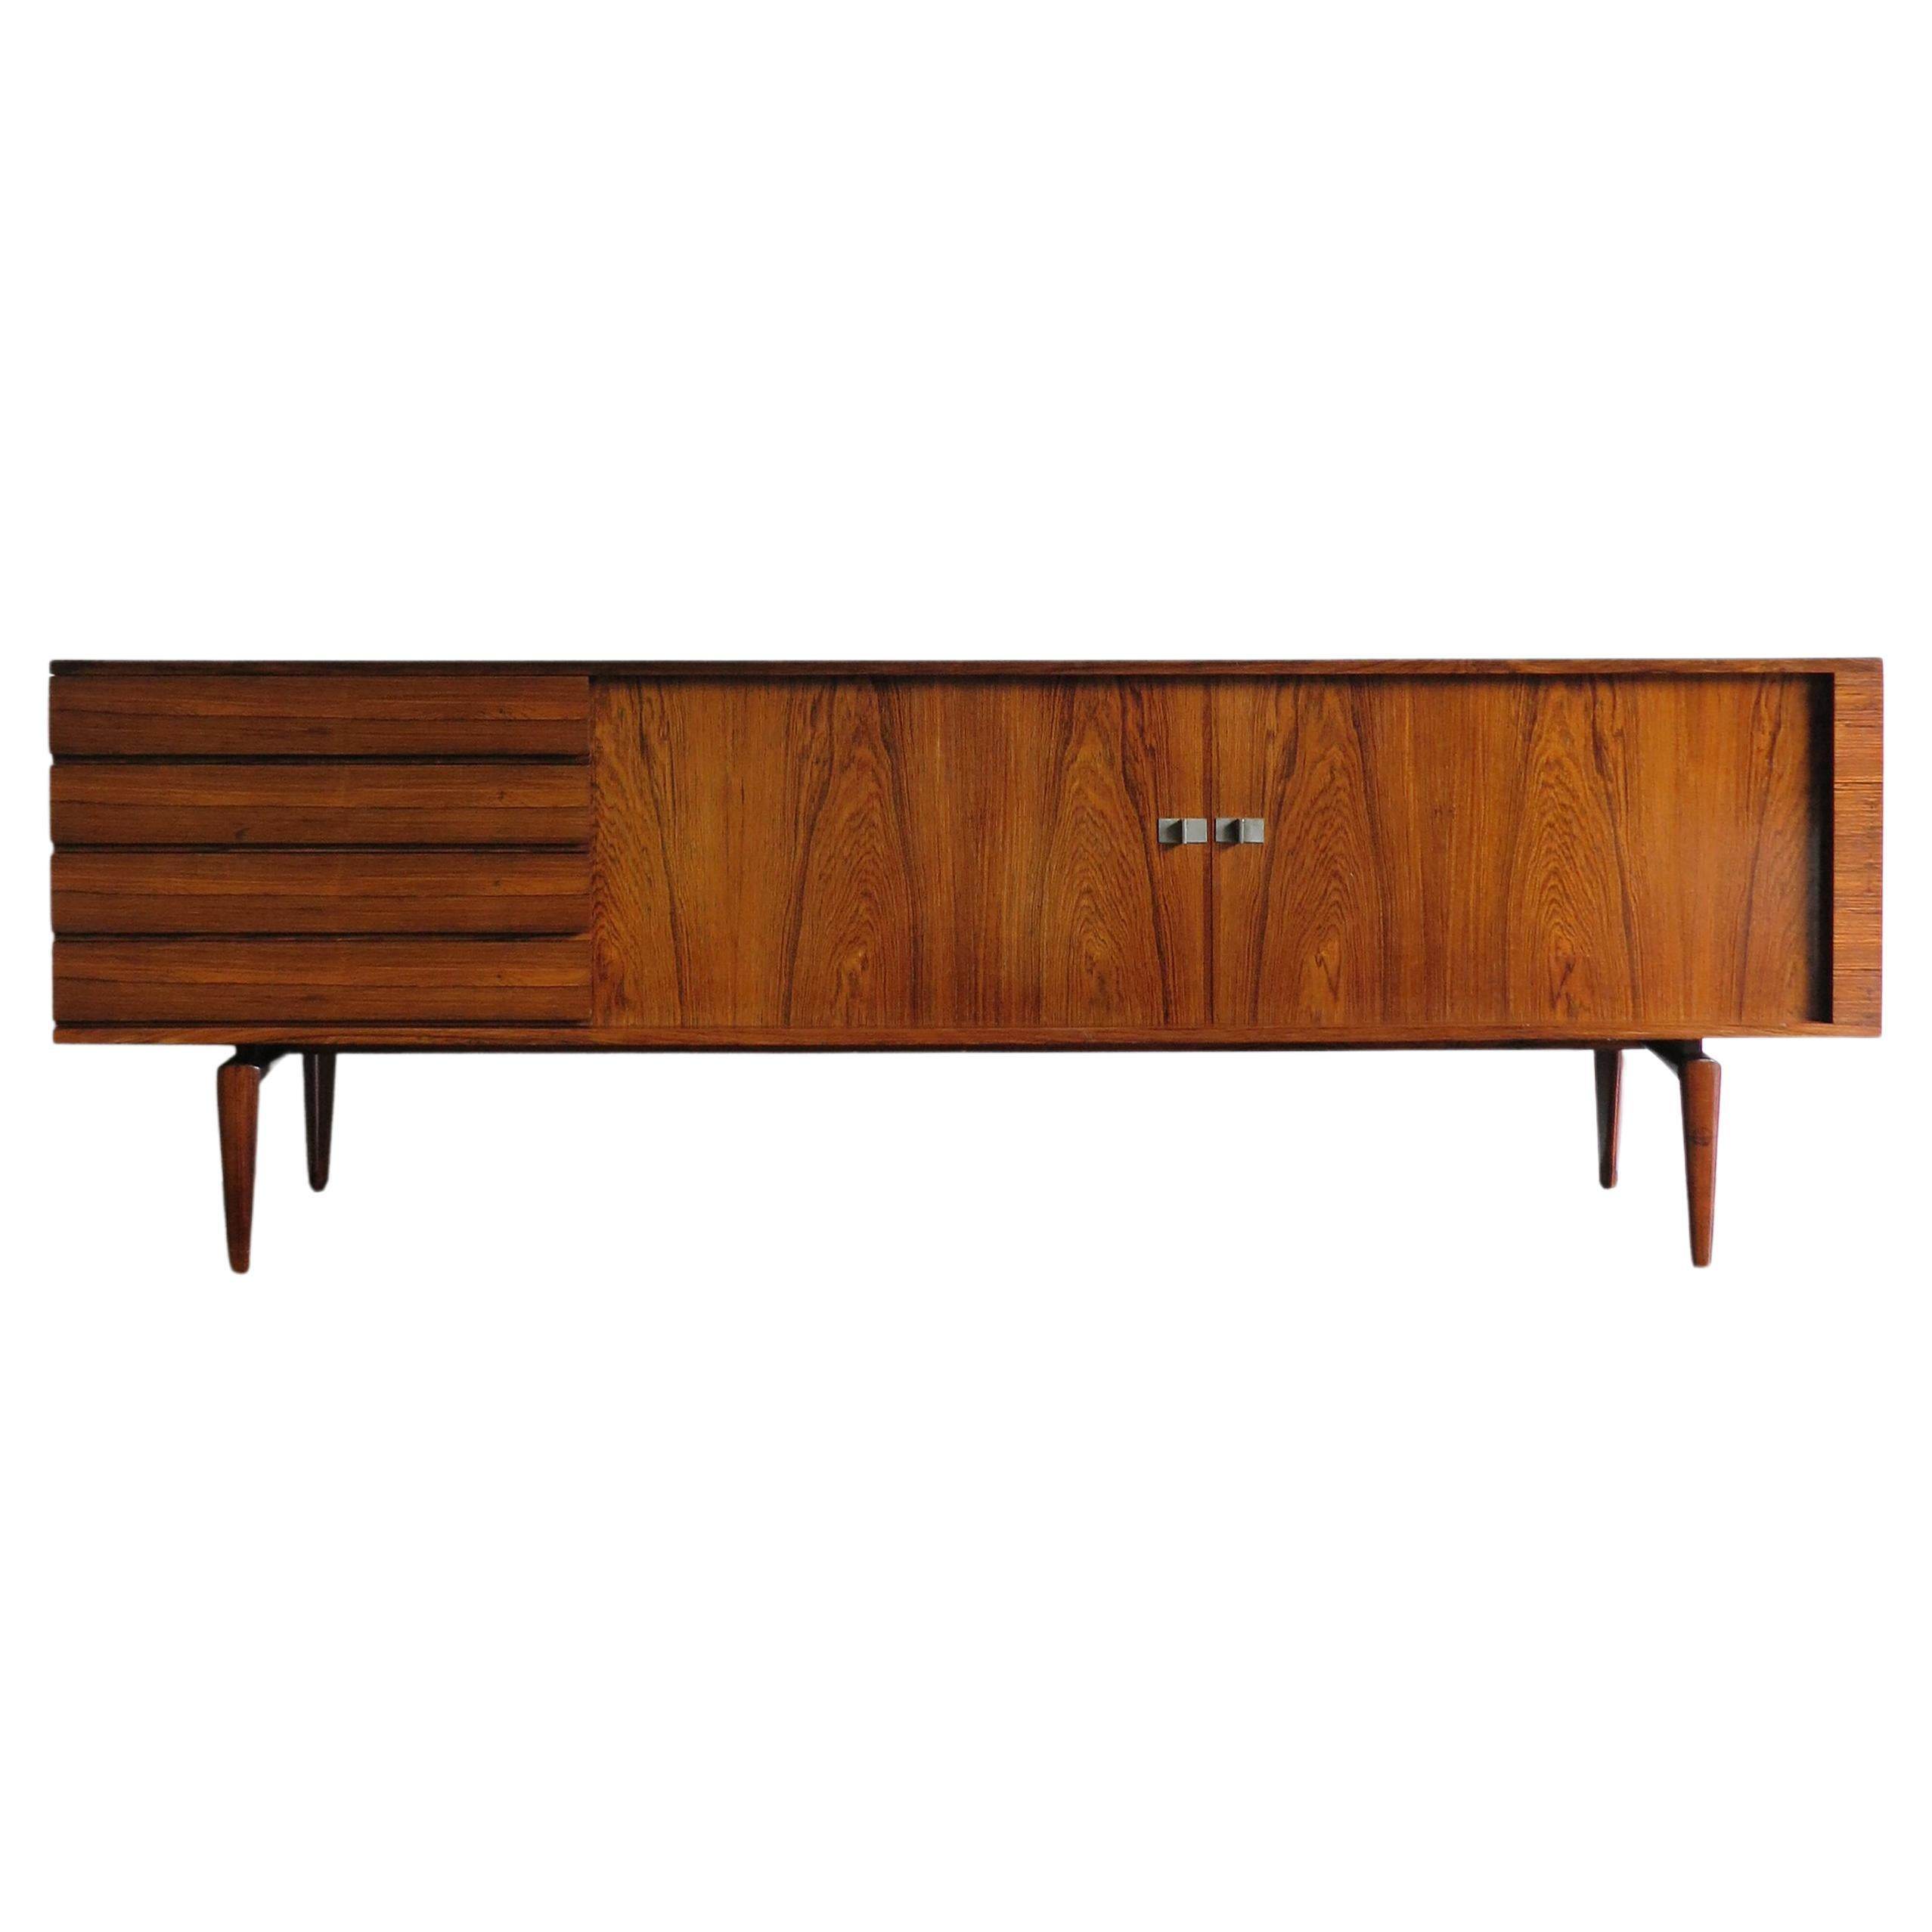 Henry Walther Klein Scandinavian Midcentury Dark Wood Sideboard, 1950s